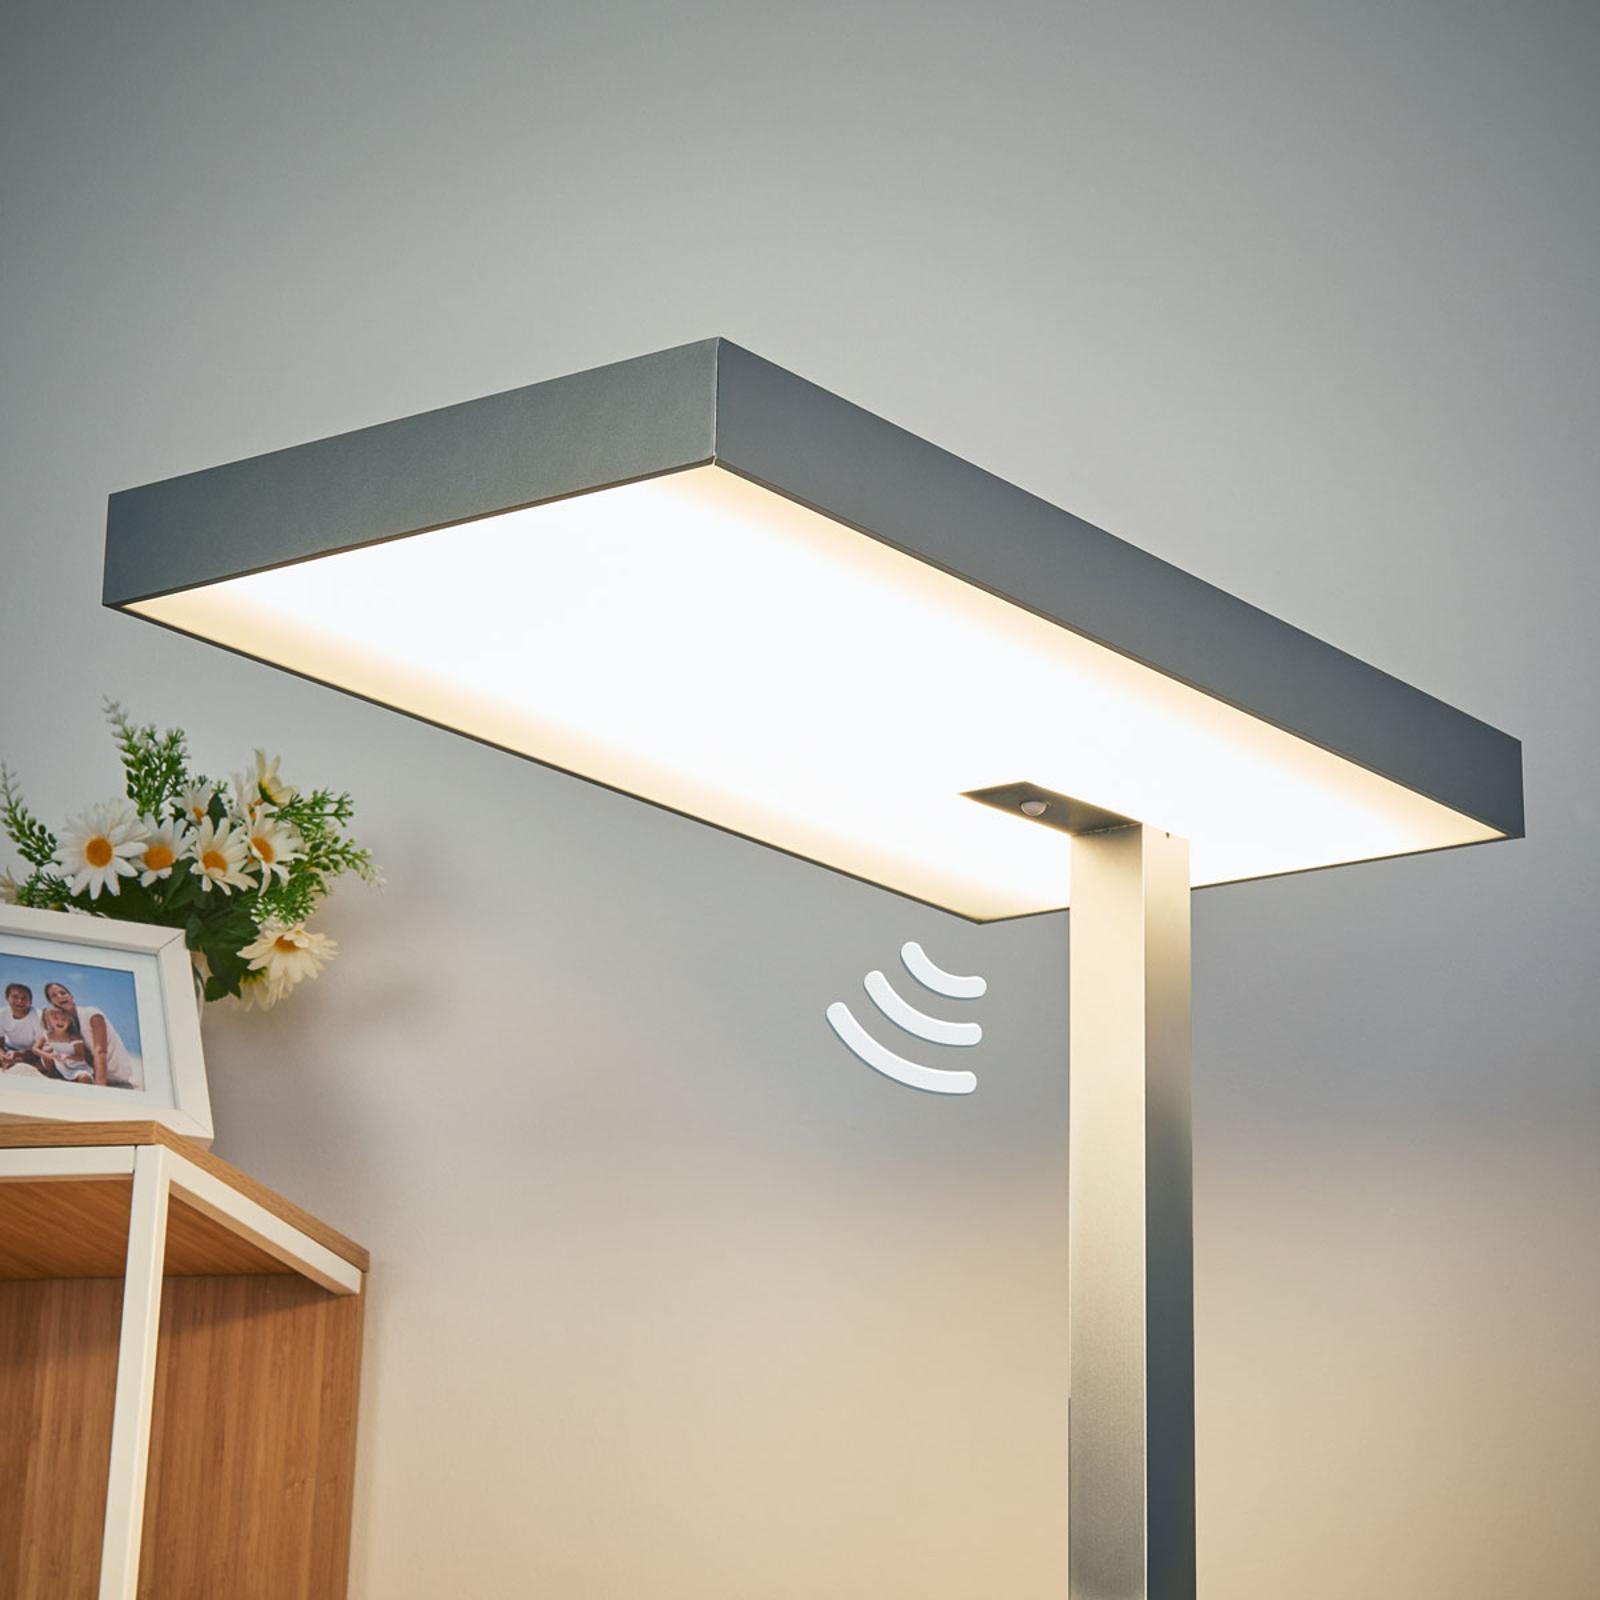 Bureau LED vloerlamp Nora met bewegingssensor